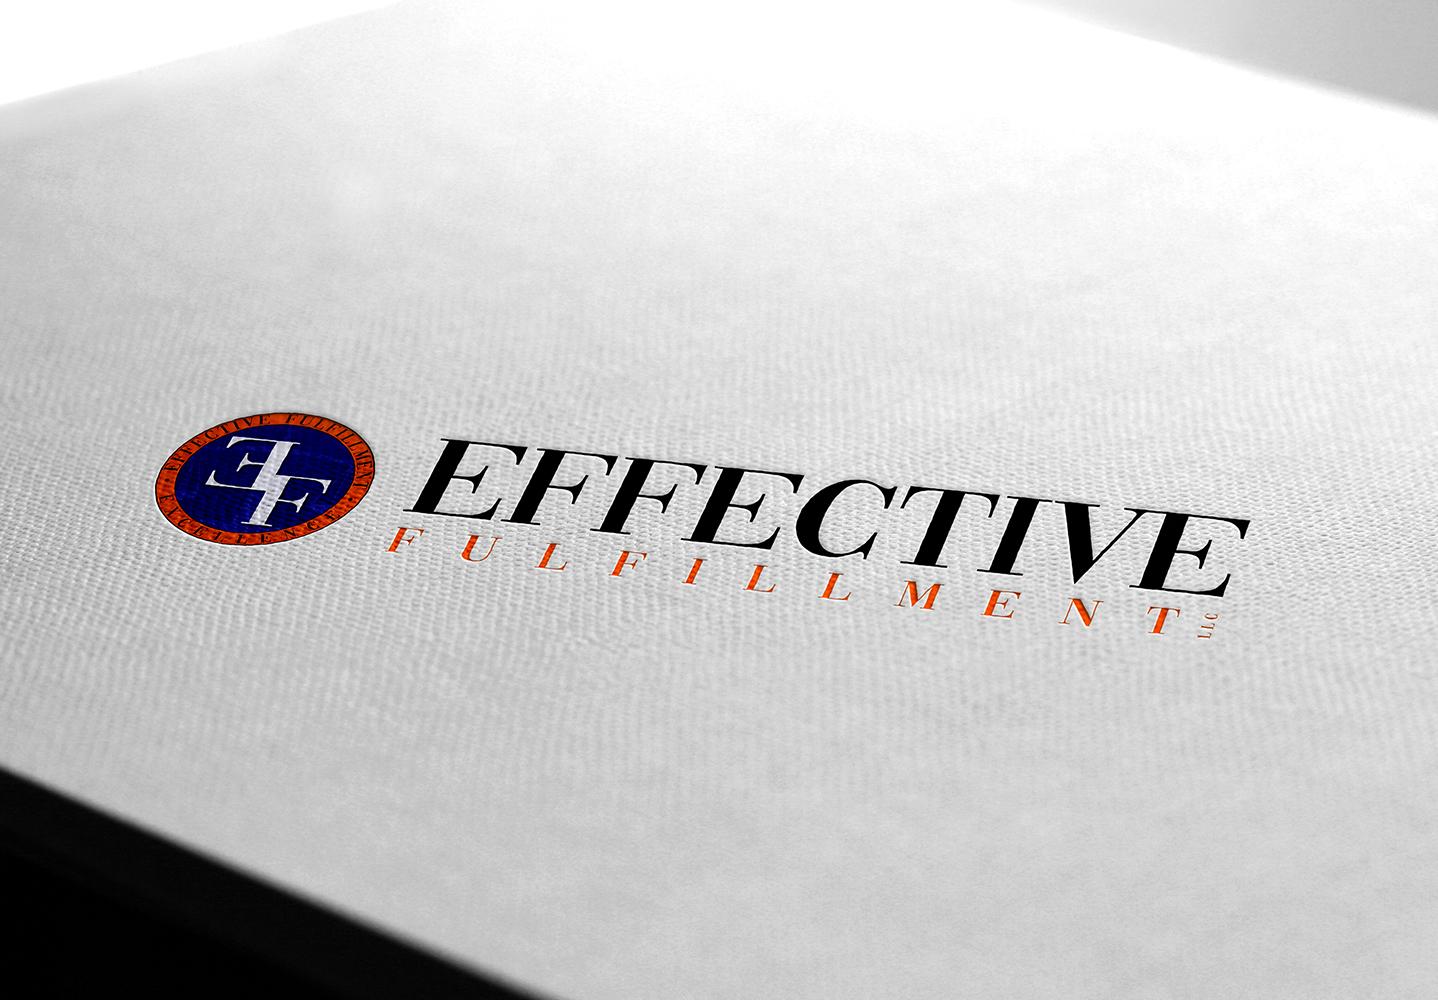 7i-effective-fulfillment